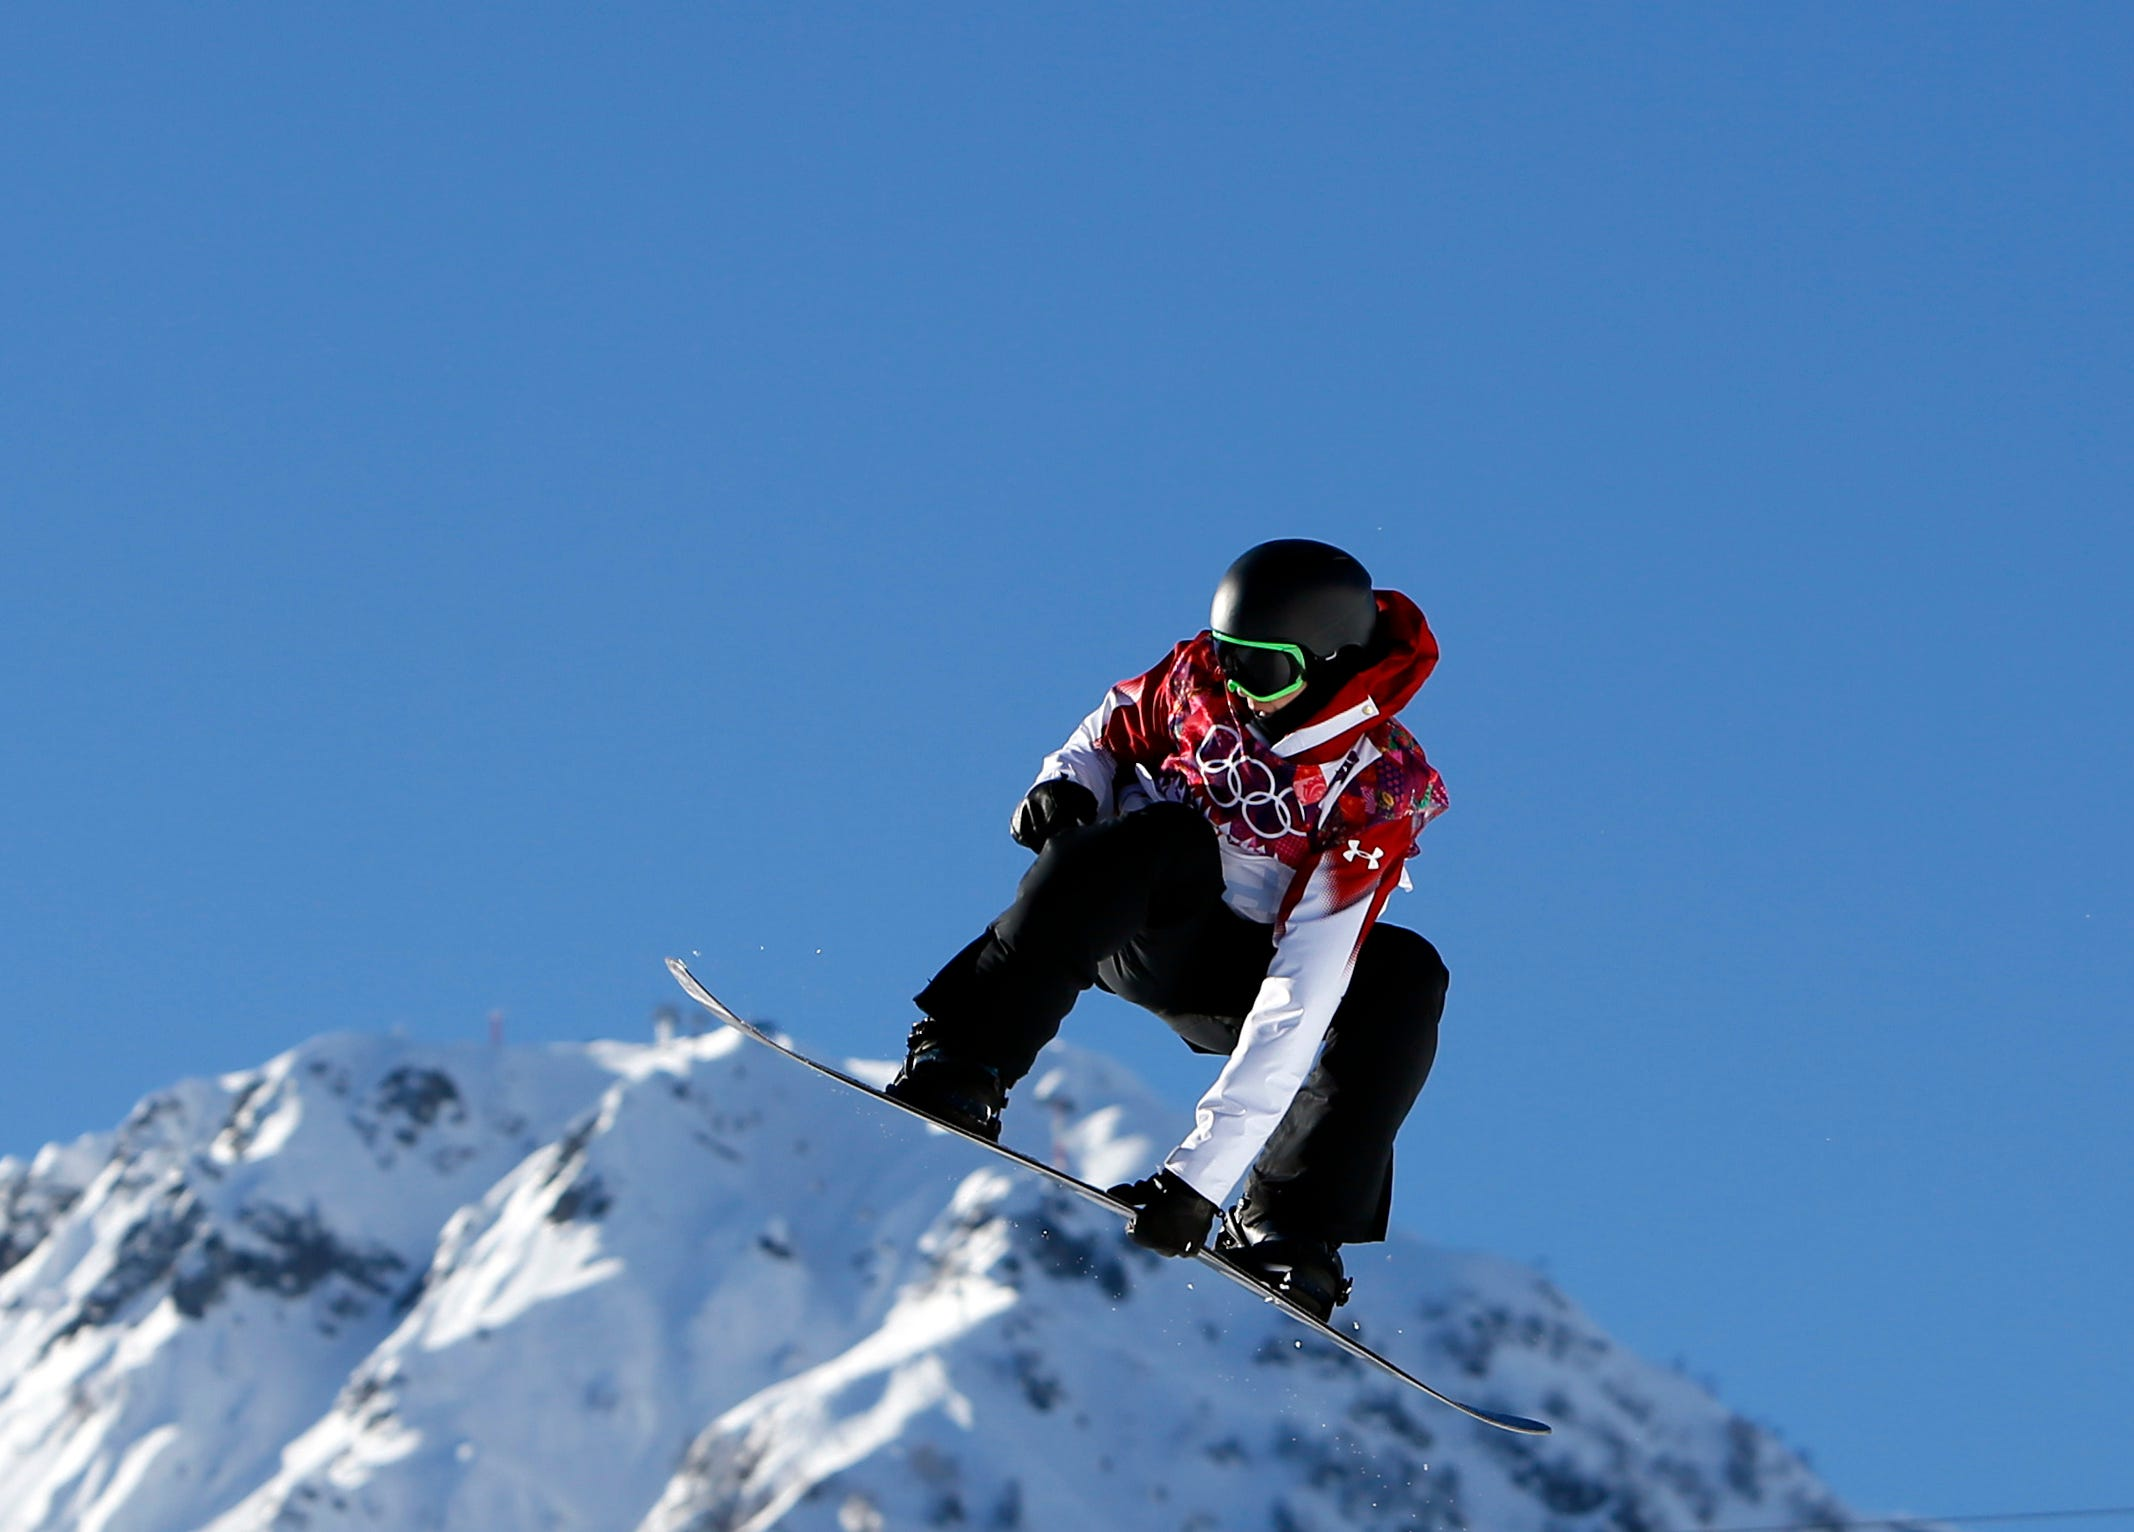 1391845487000-USP-Olympics-Snowboarding-